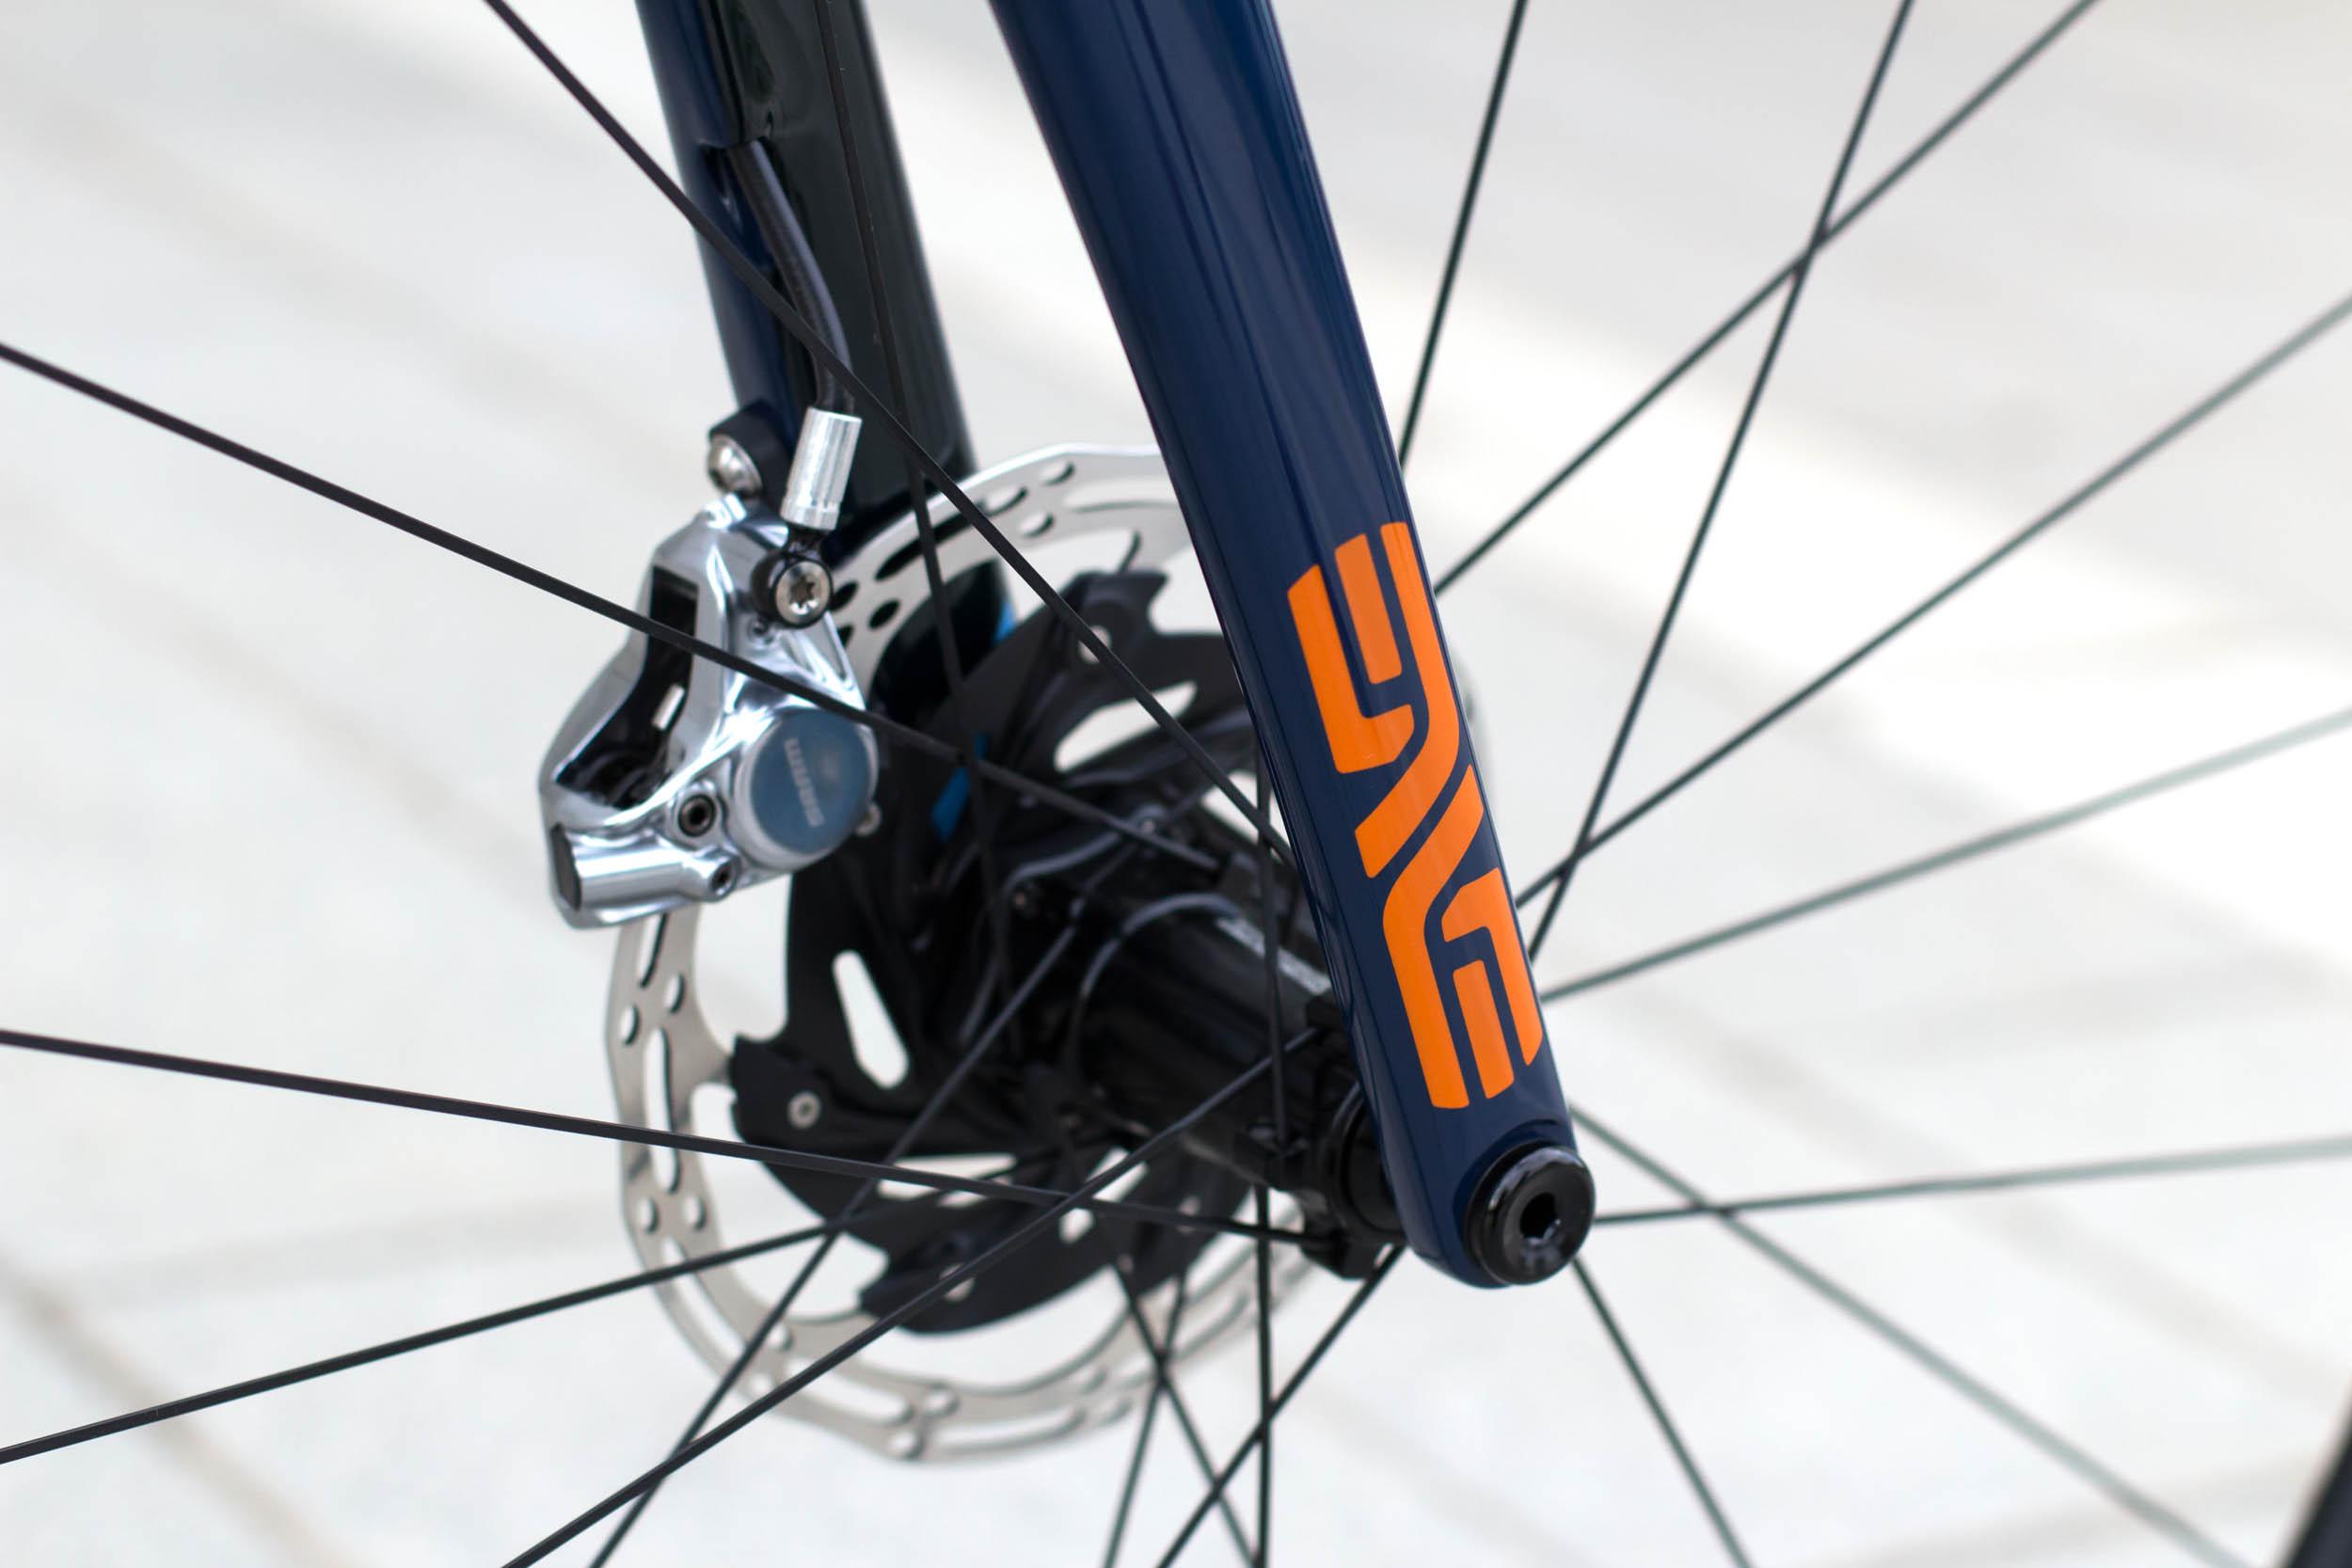 quirk_cycles_charlie_sheldon_durmitor_02.jpg